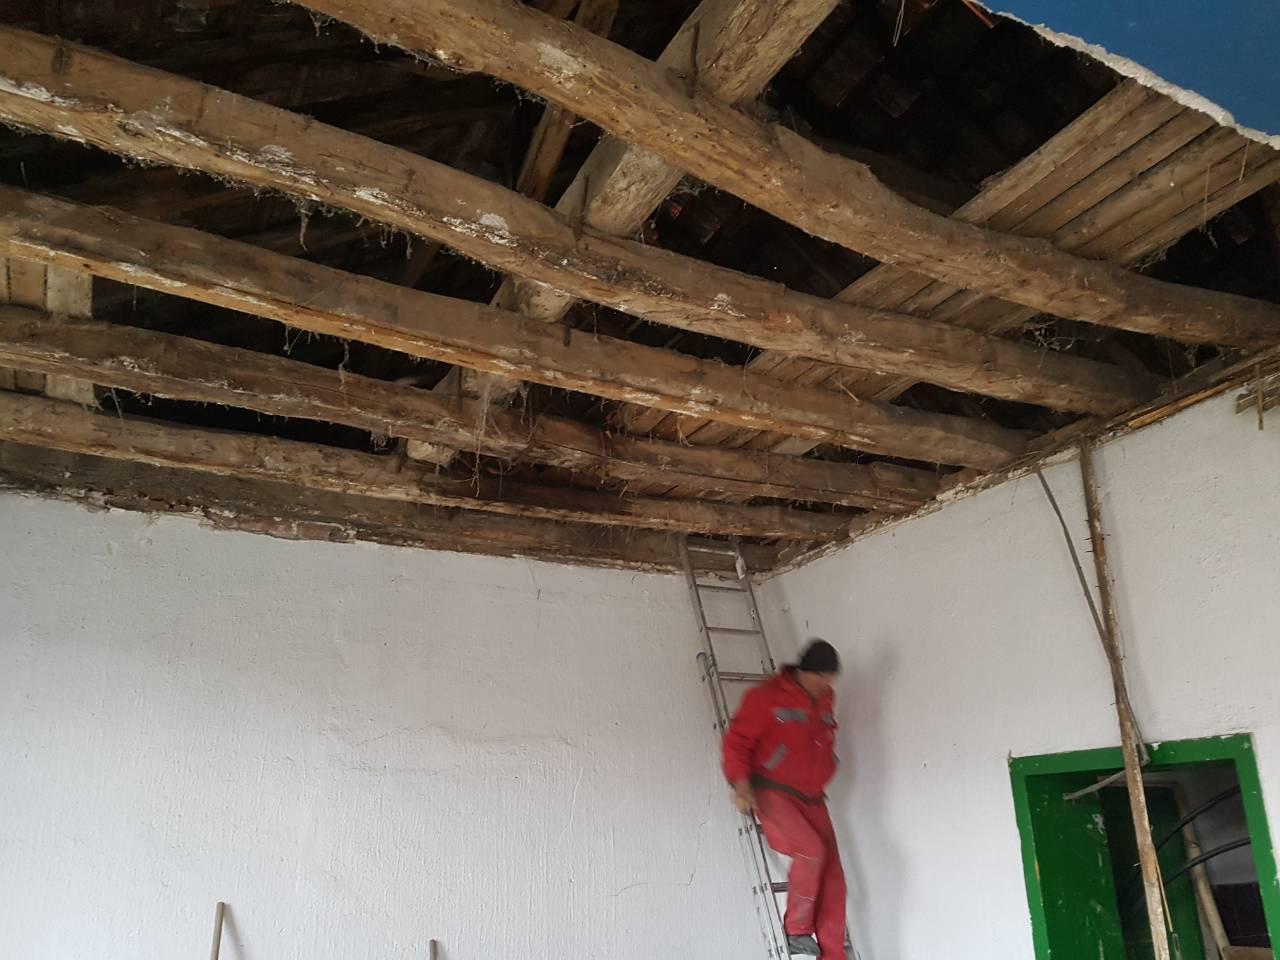 Rekonstrukcija objekta MZ Niševac u Niševcu